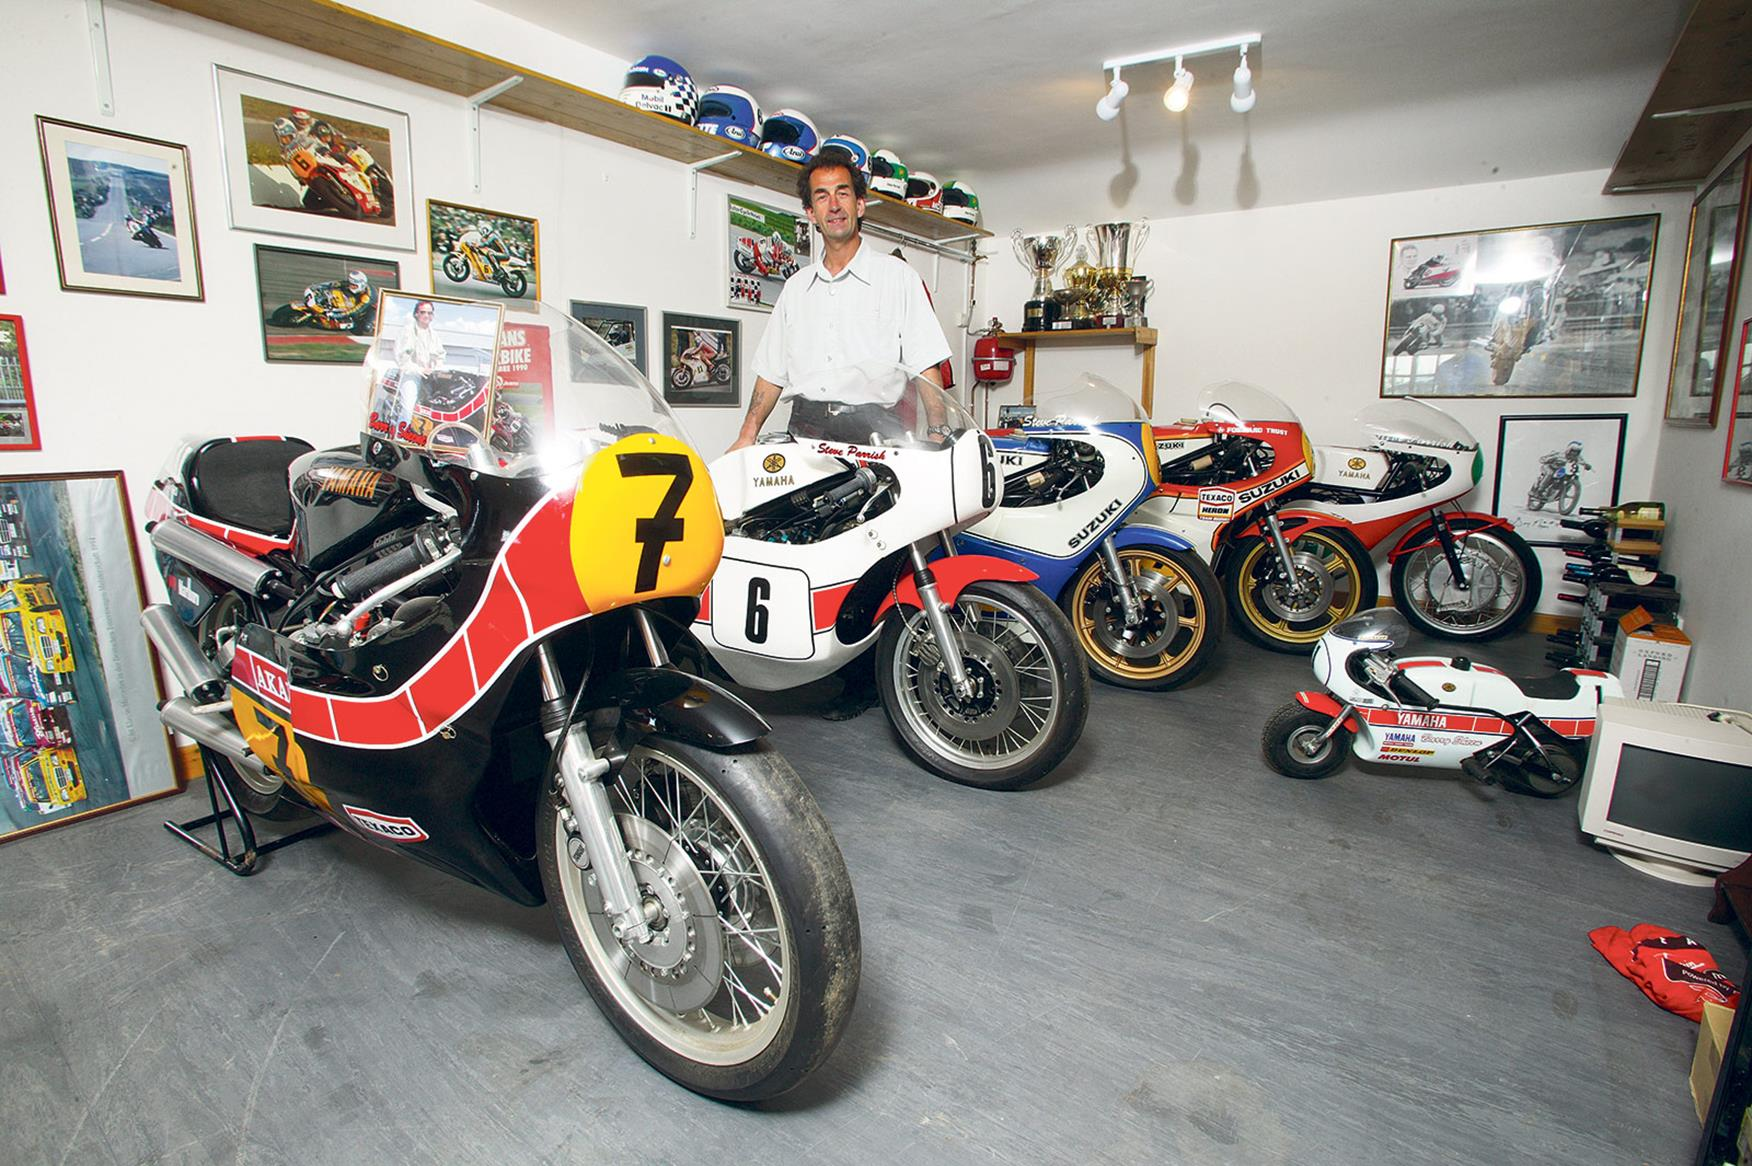 My life in bikes: Steve Parrish